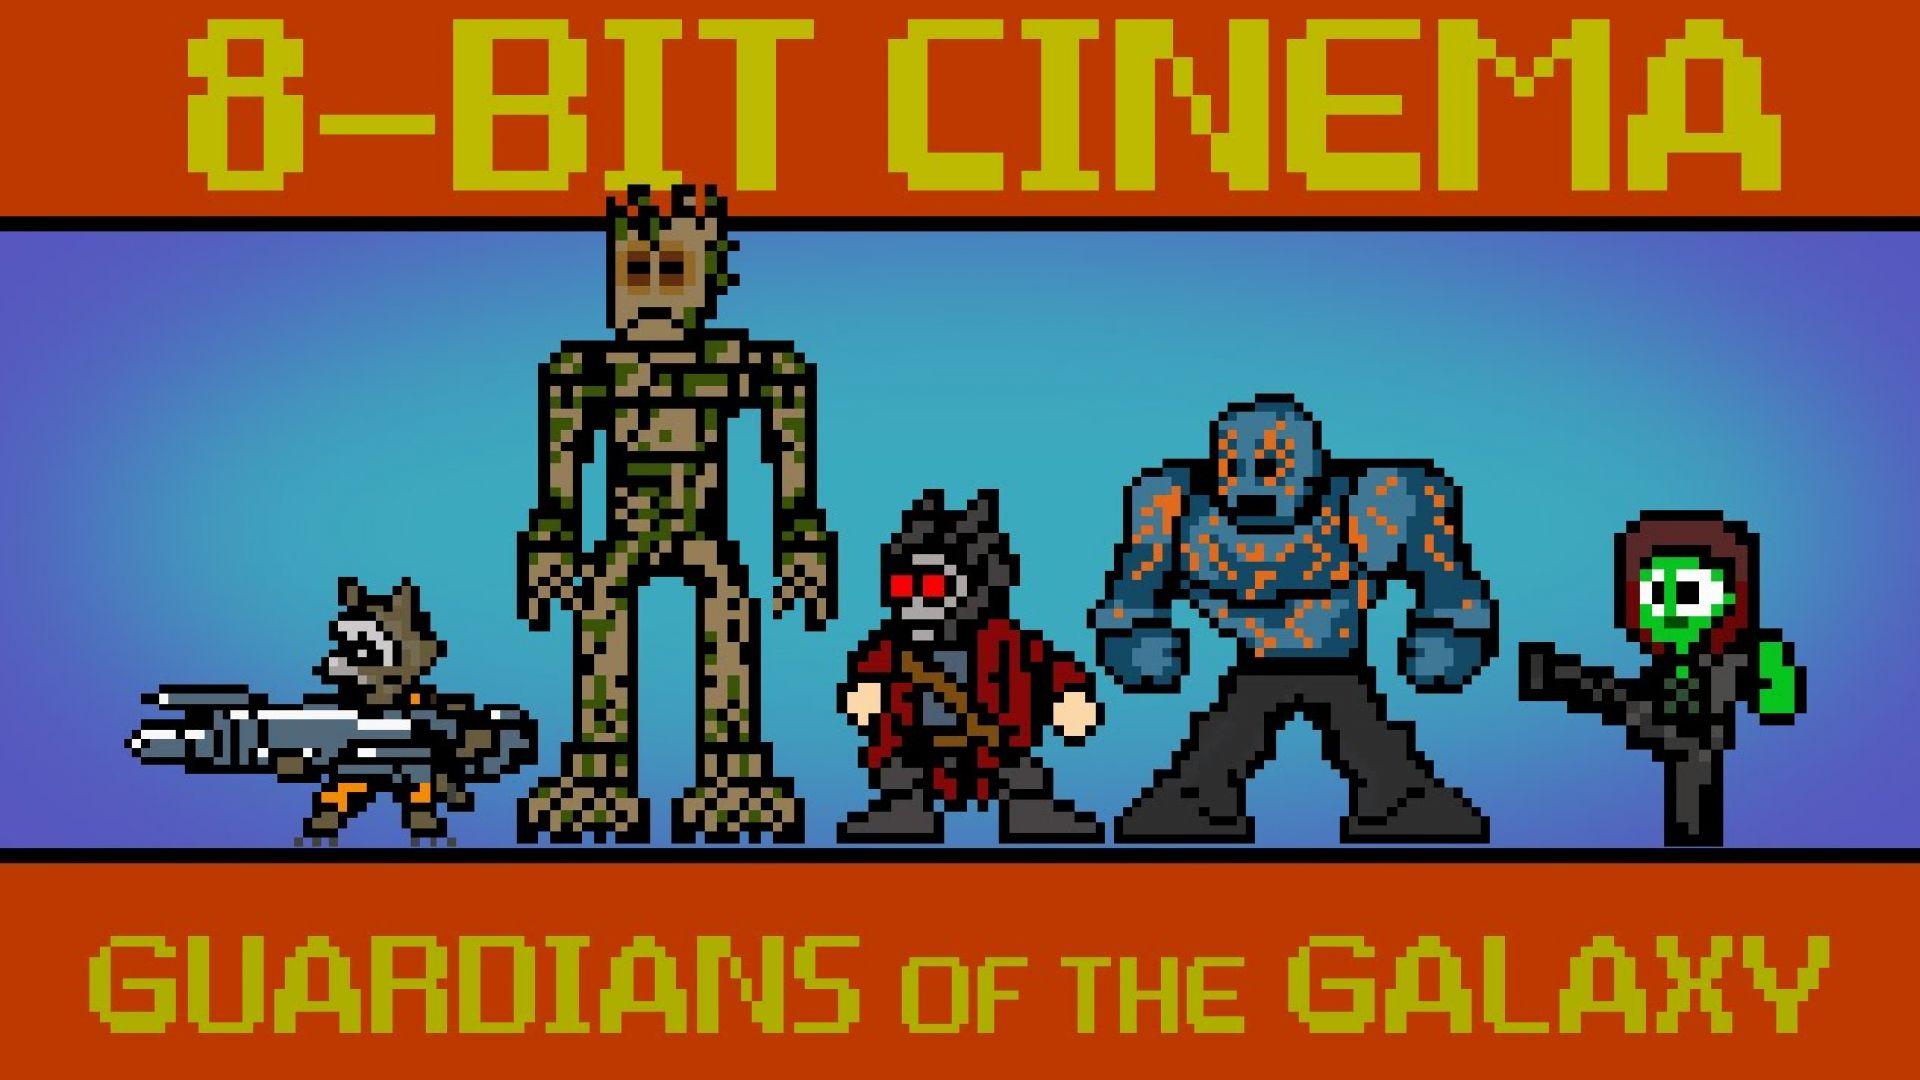 8-Bit Cinema Presents 'Guardians of the Galaxy'